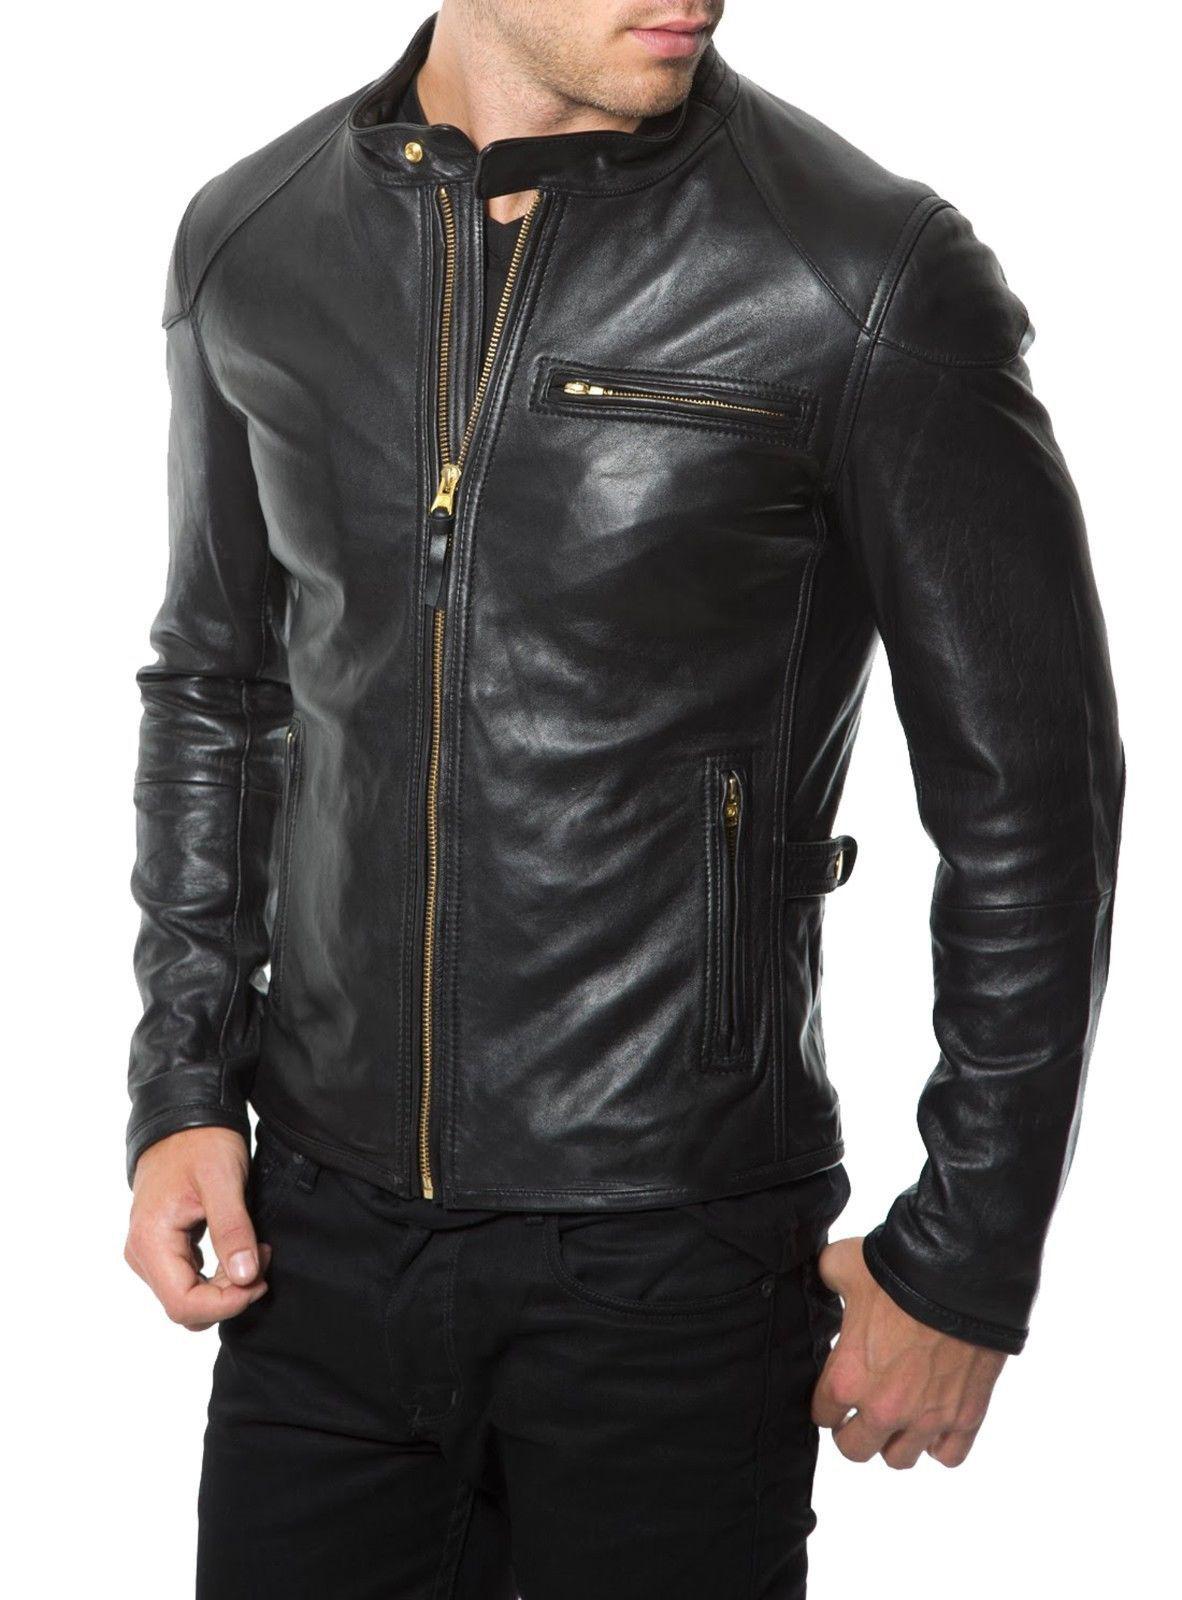 Leather jackets for men online